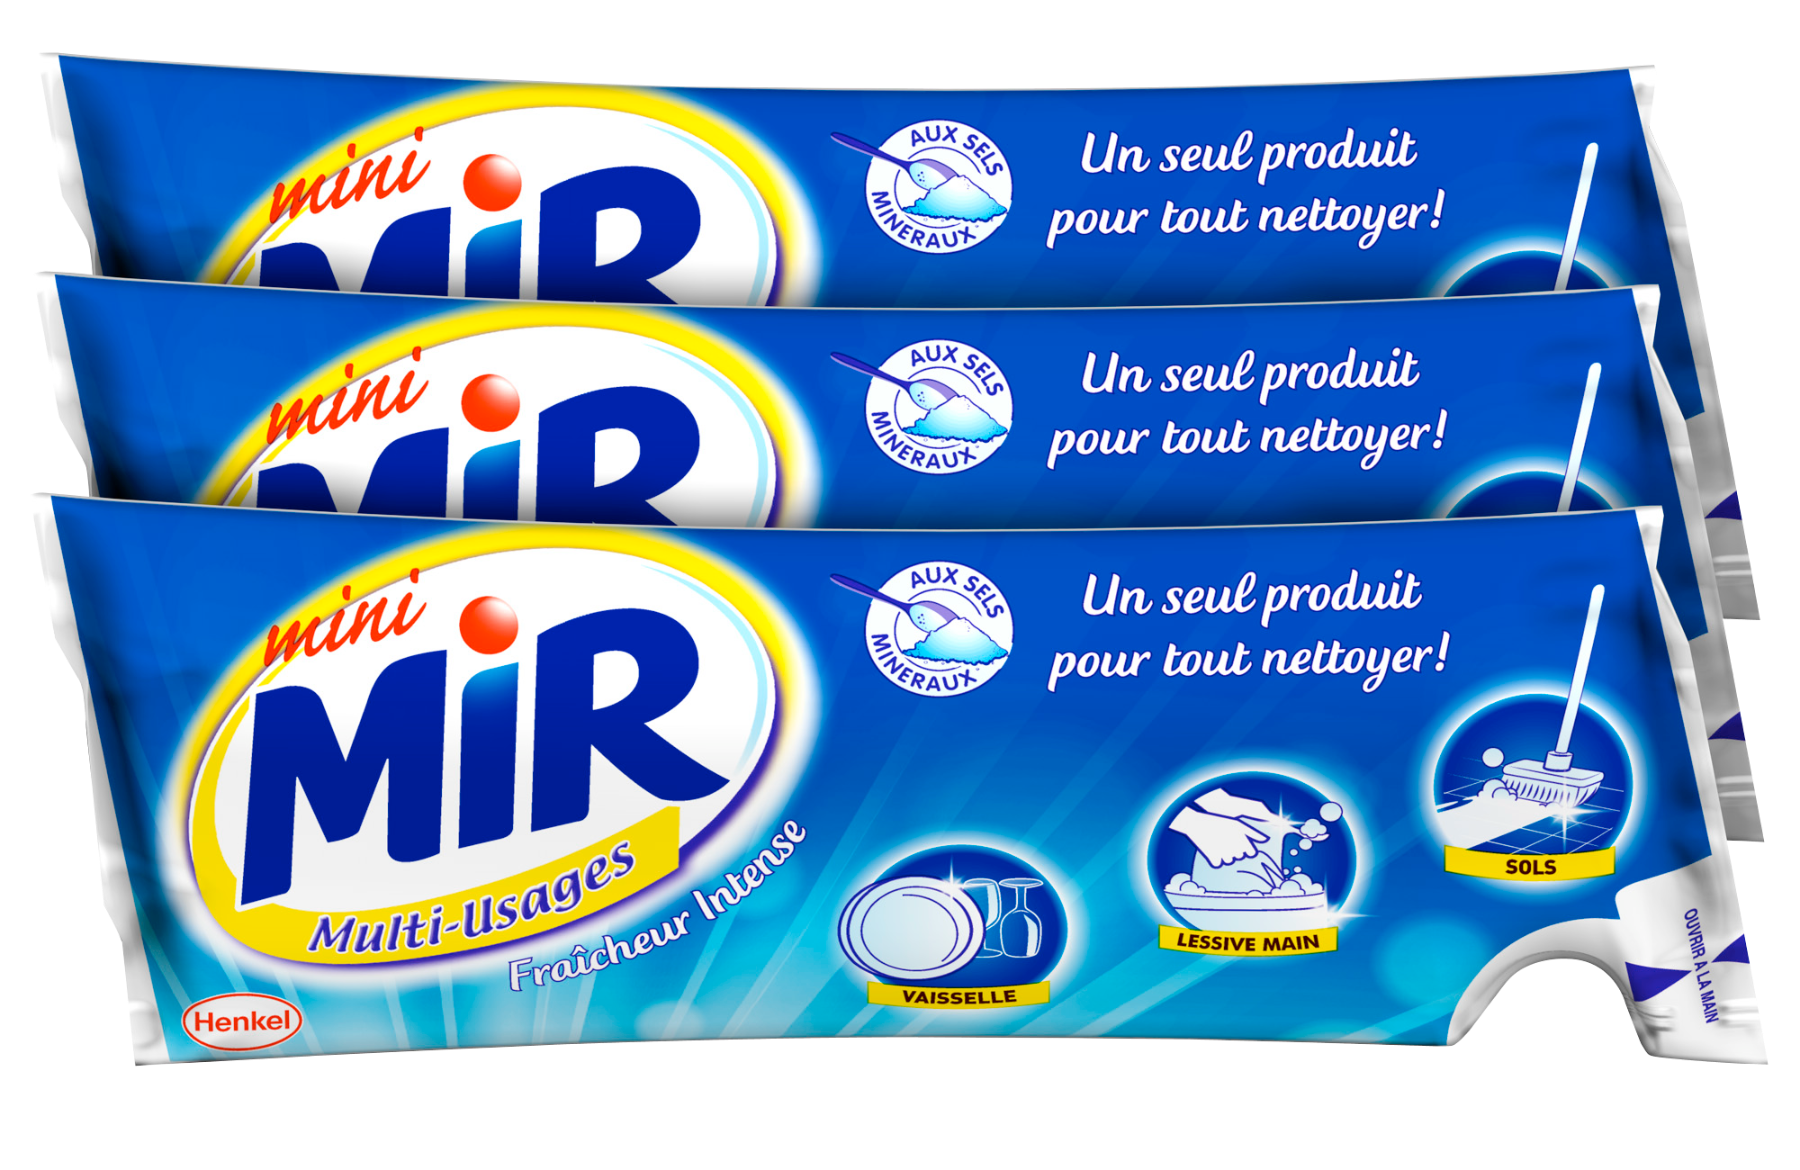 Mini Mir Detergent Multi Usage La Belle Adresse